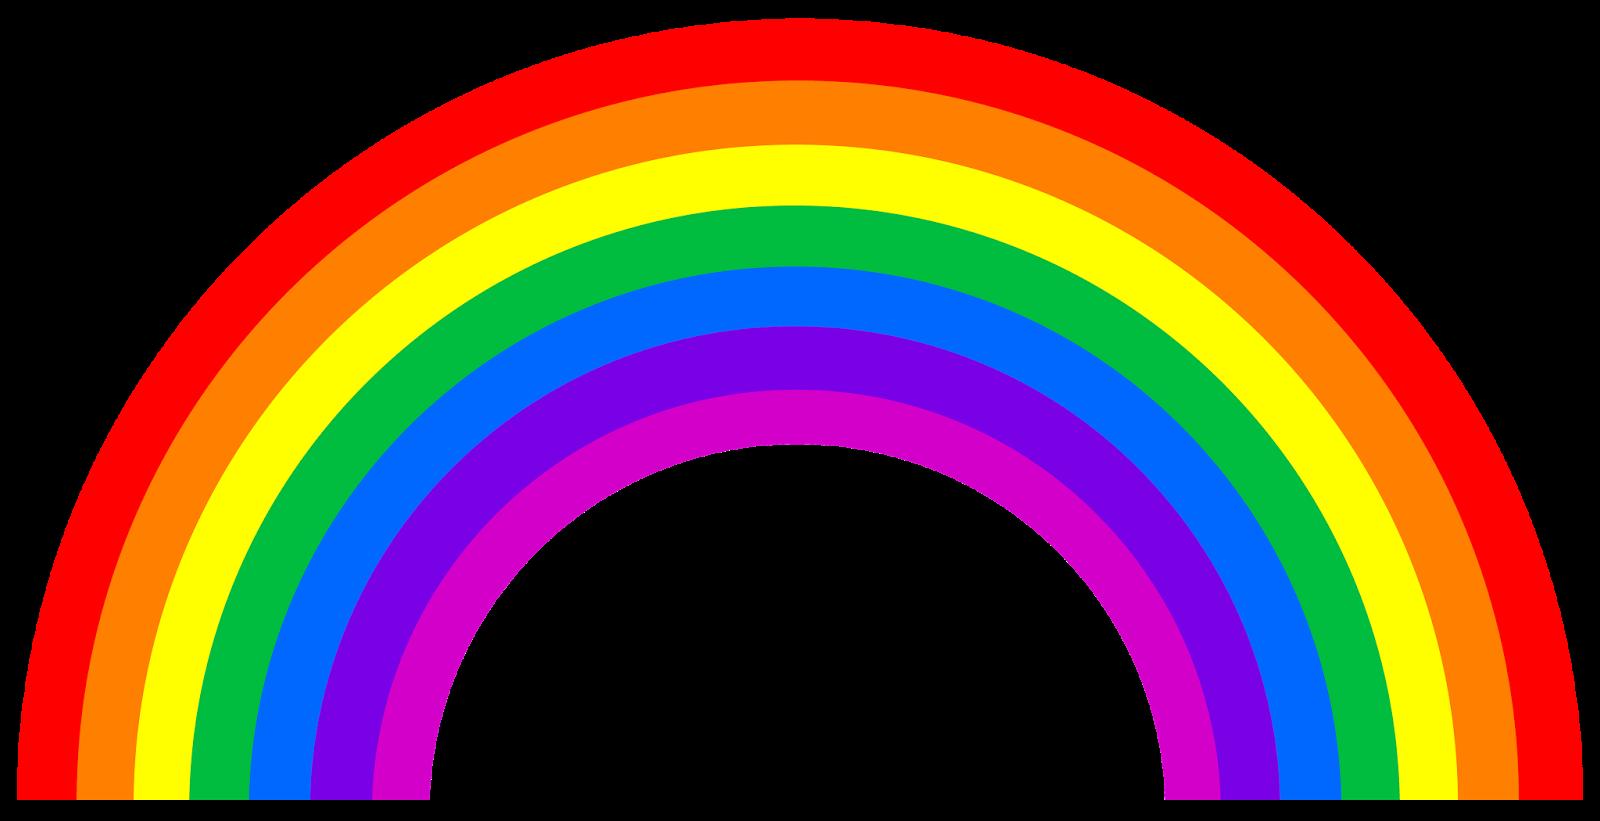 essence of the color wheel intelligent design or man rainbows. Black Bedroom Furniture Sets. Home Design Ideas